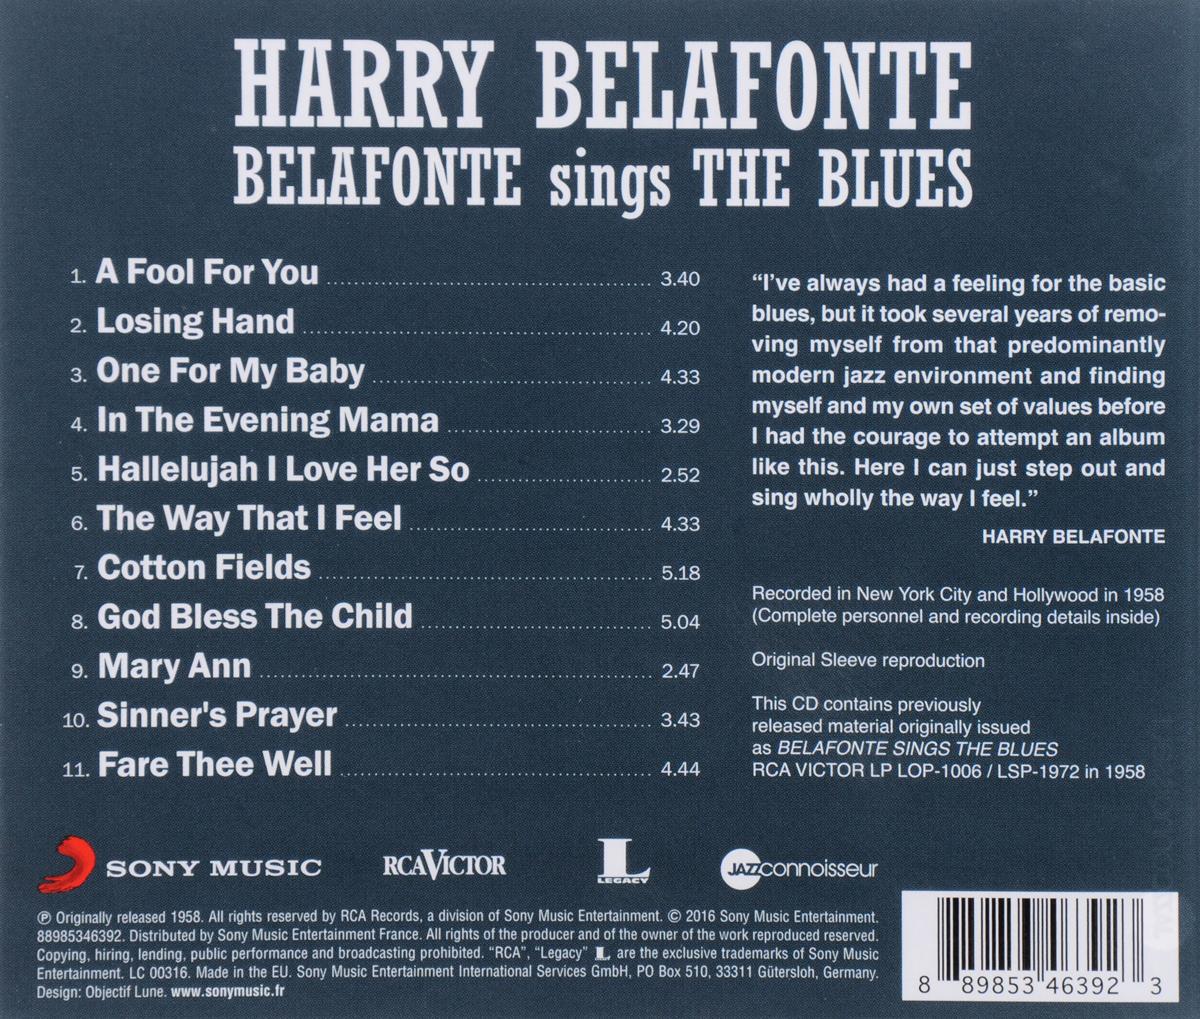 Harry Belafonte.  Belafonte Sings The Blues Warner Music,Sony Music Entertainment, Inc.